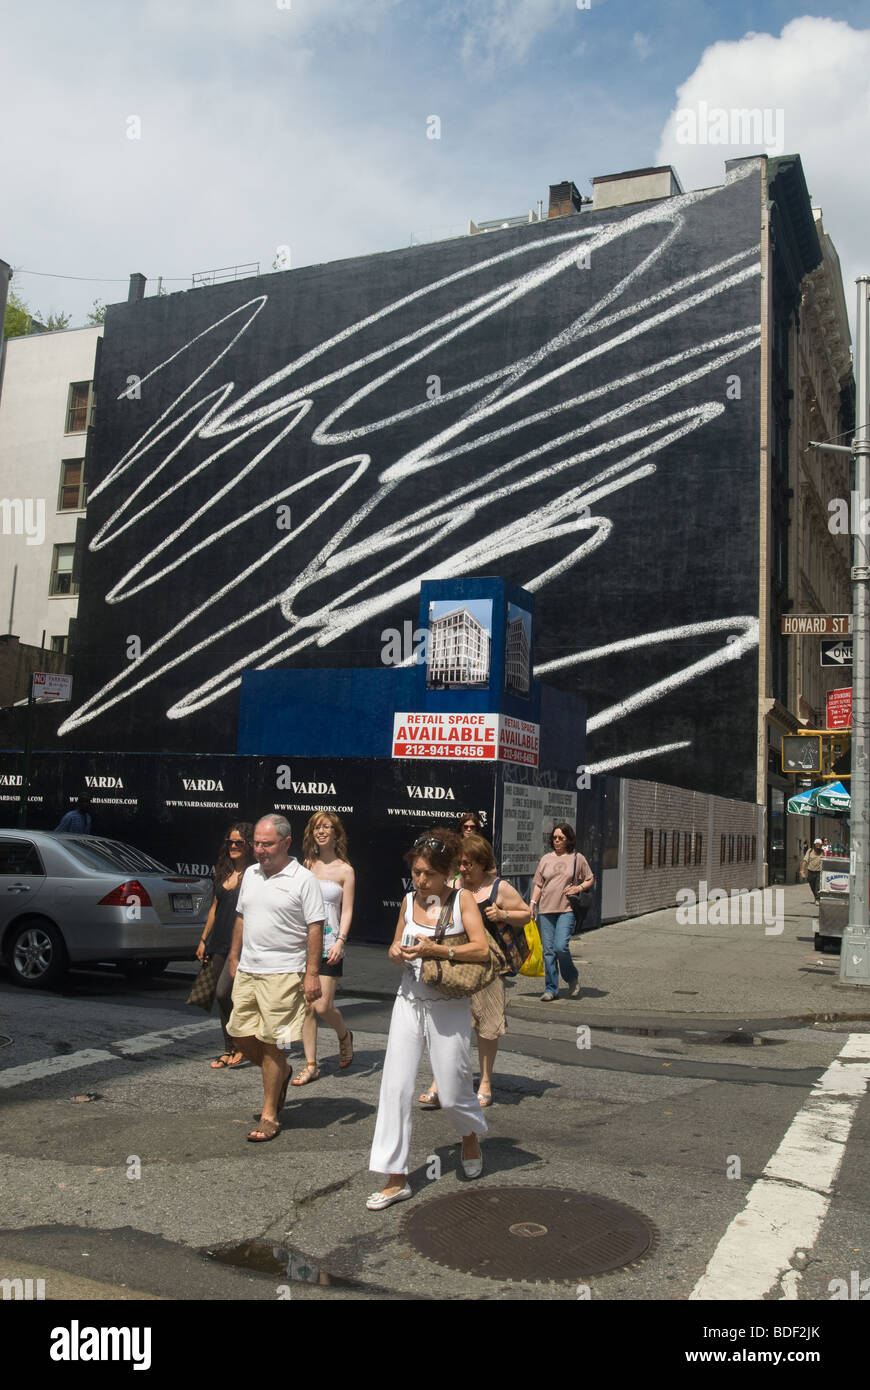 The Scribble mural by the artist Karl Haendel, is seen in the Soho neighborhood of New York - Stock Image